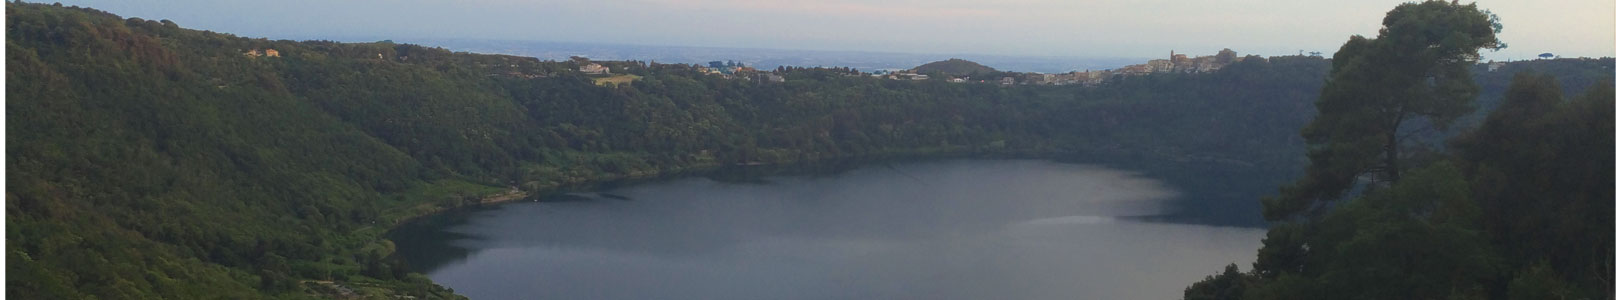 Veduta del lago di Nemi